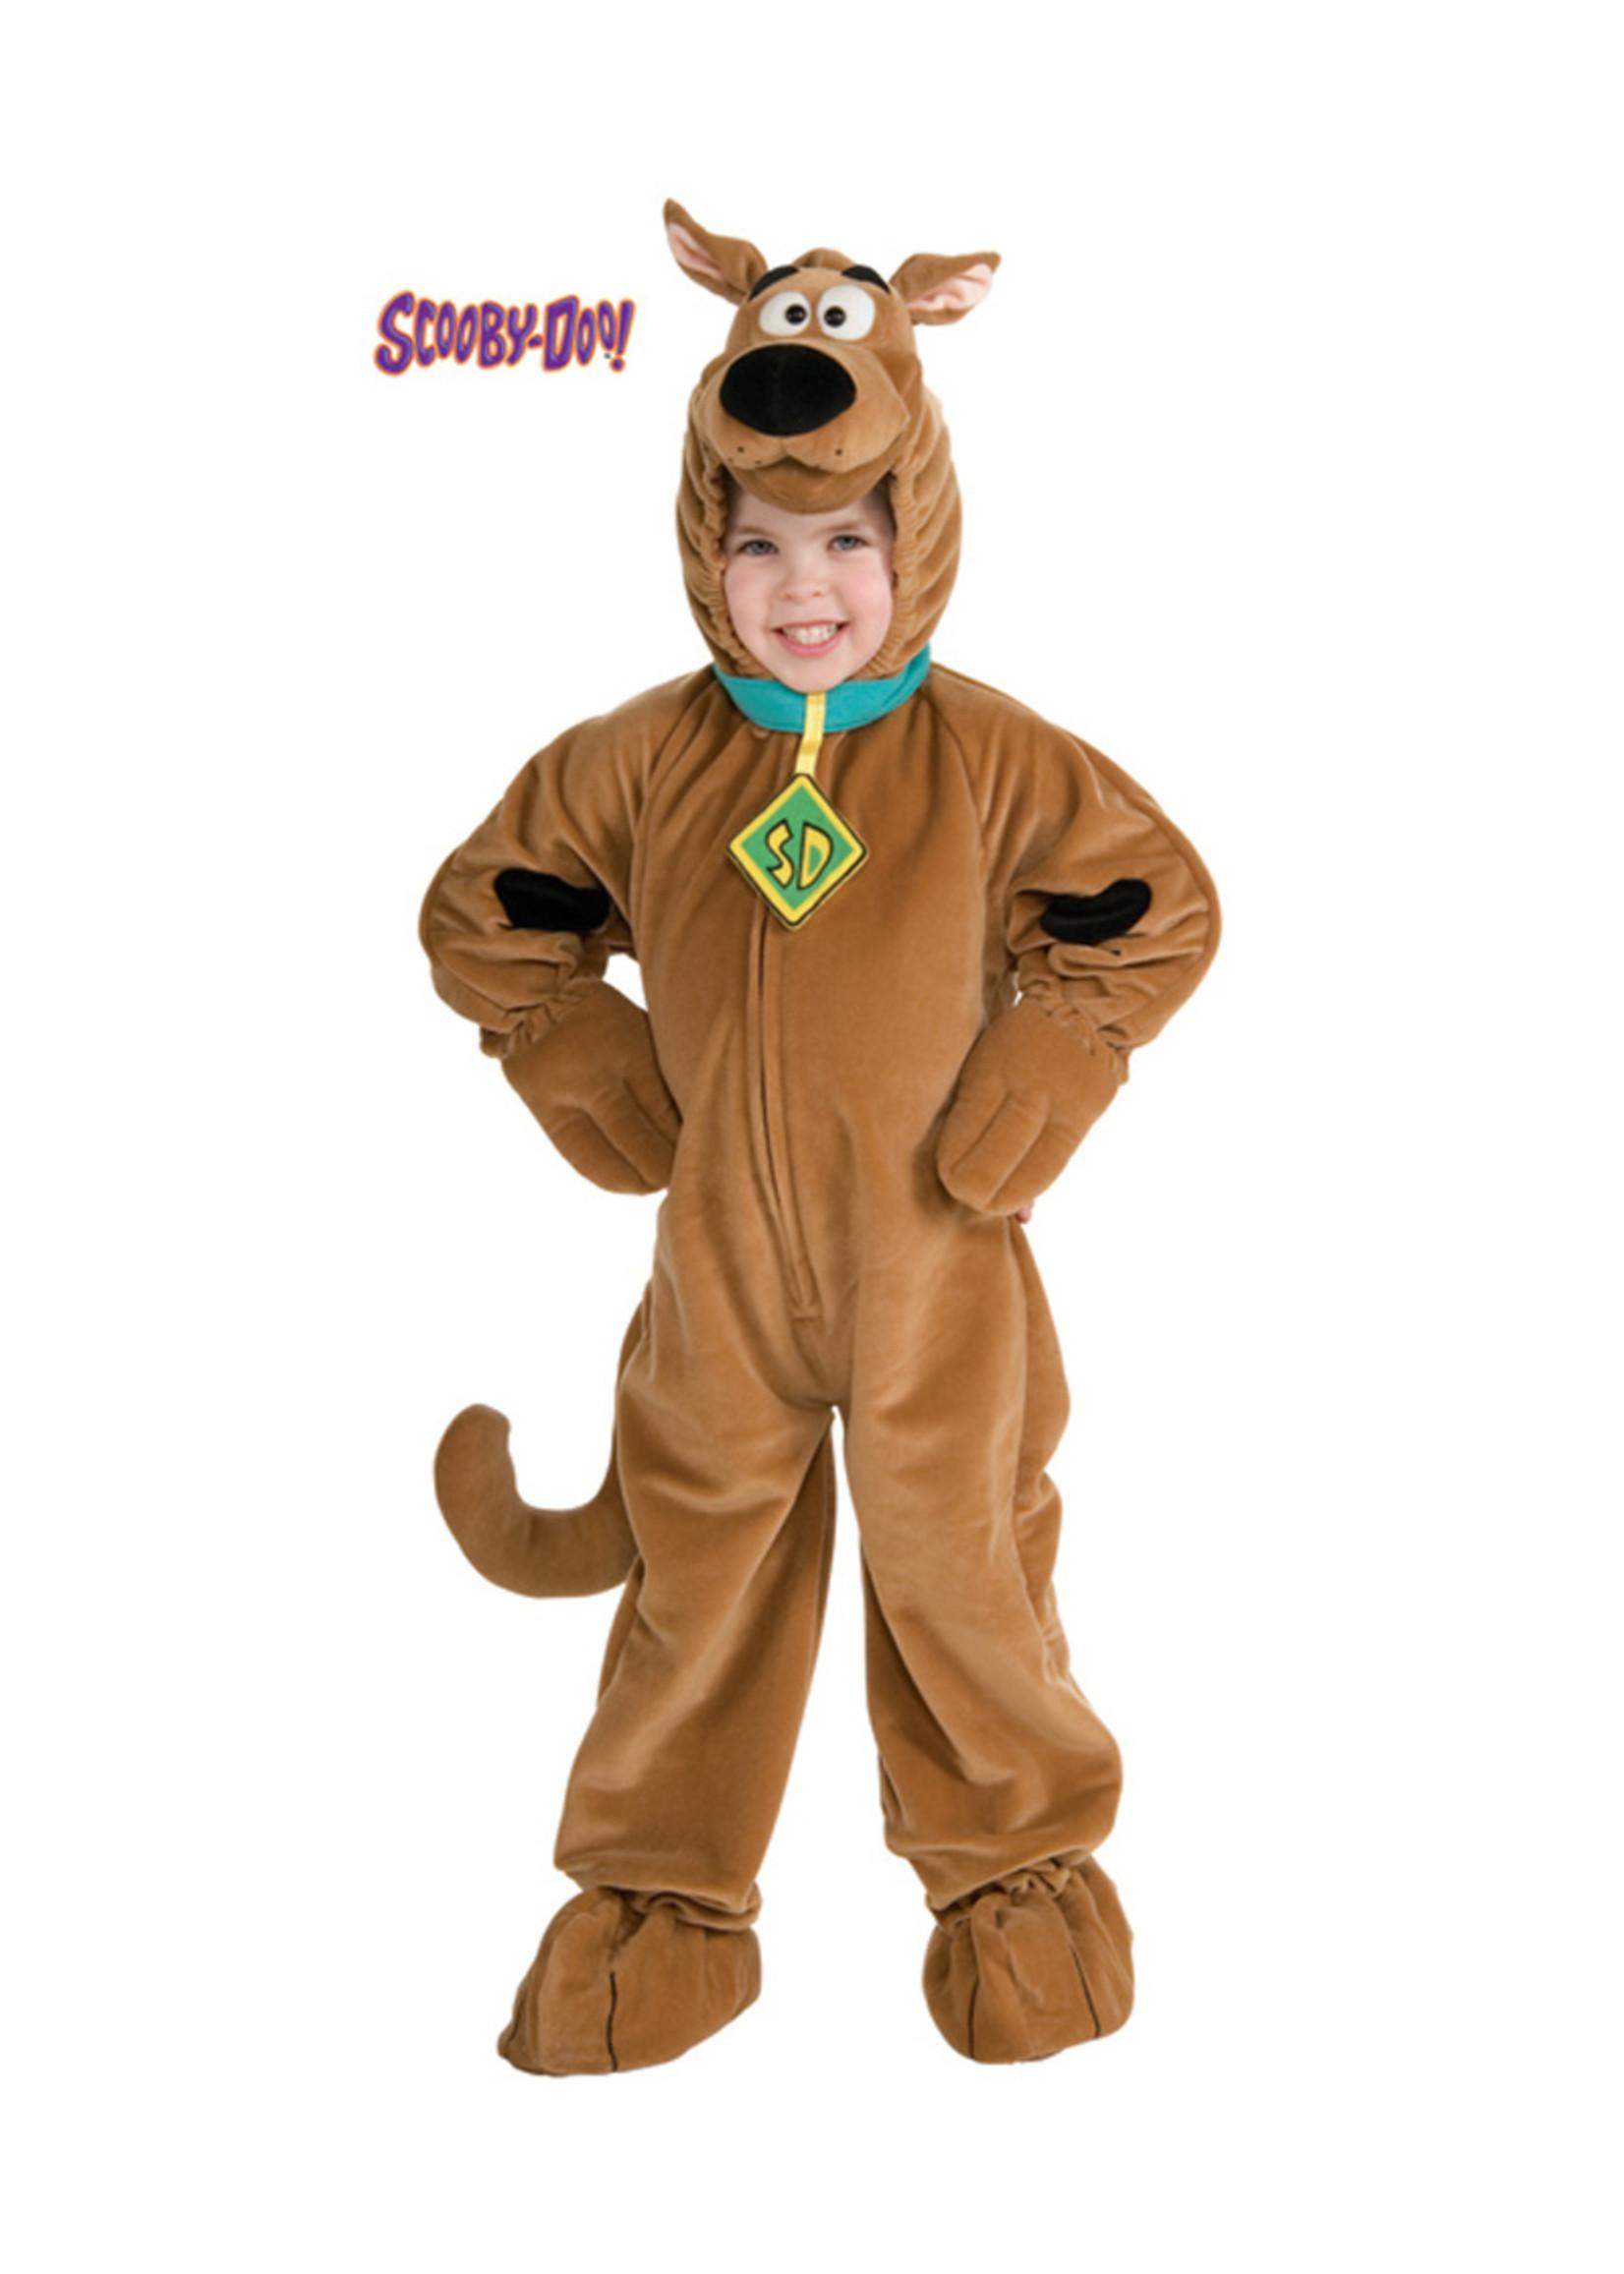 Scooby-Doo Deluxe Costume - Boys